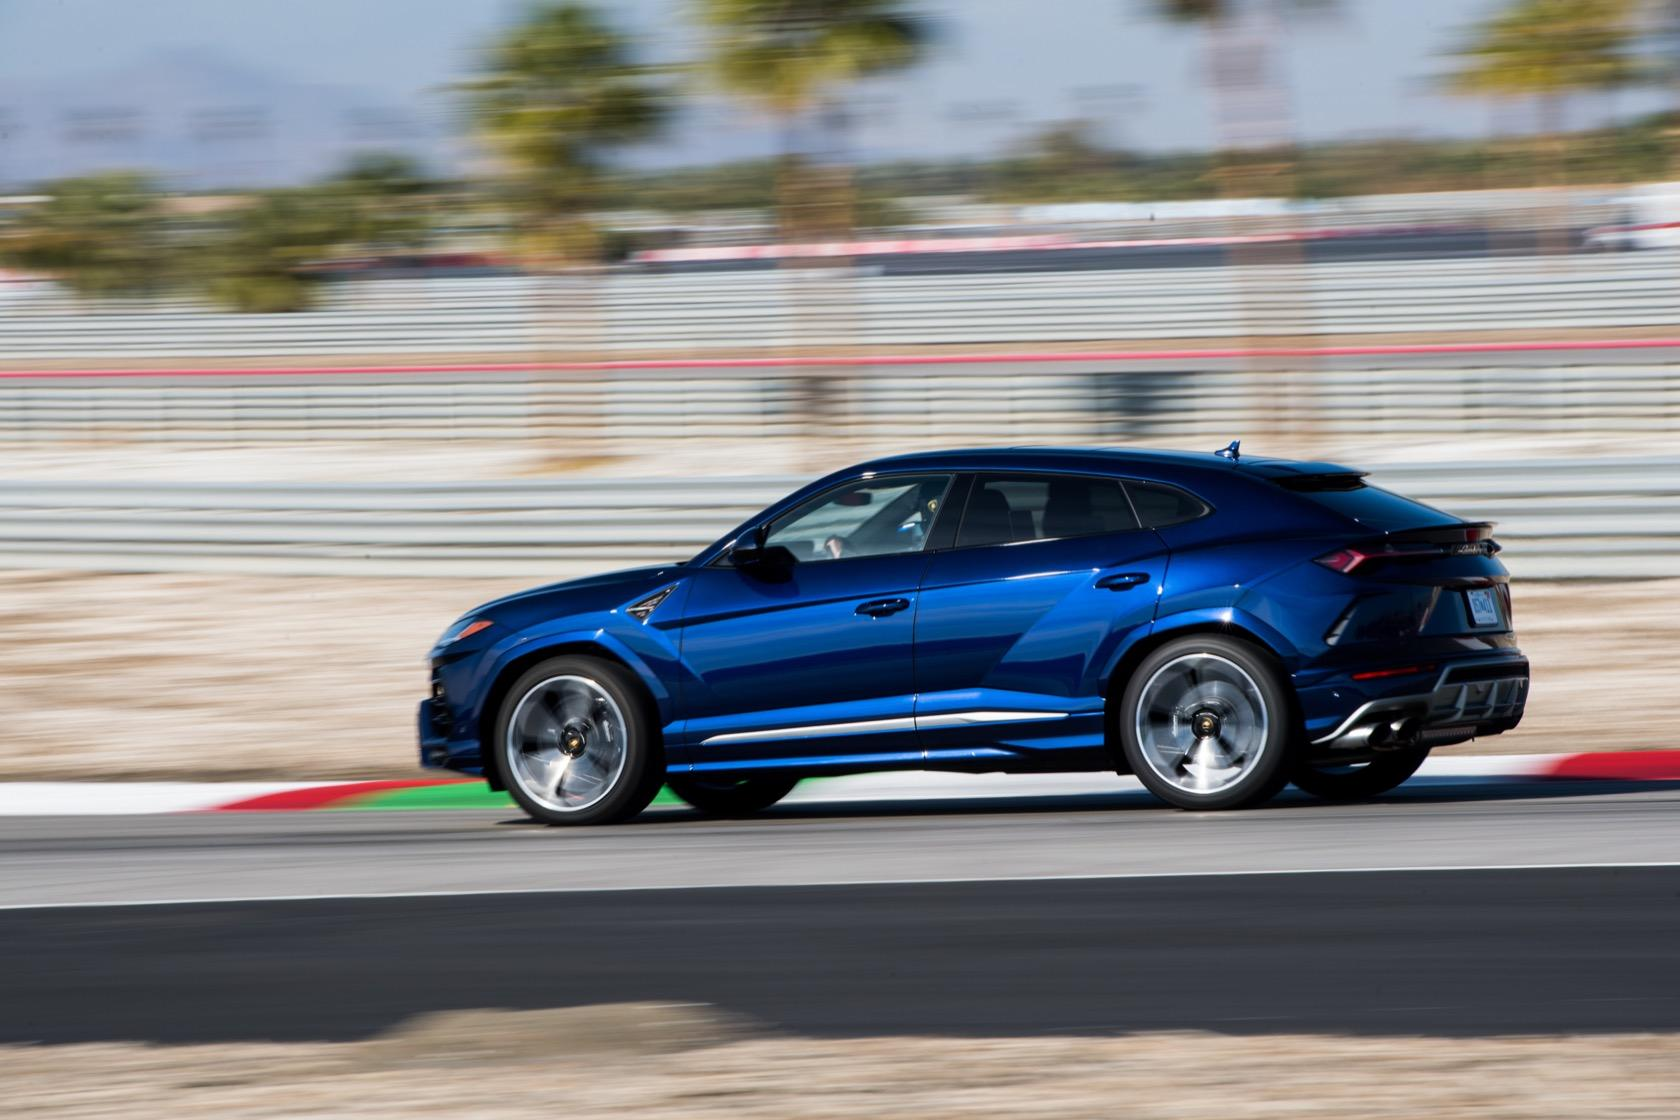 2019 Lamborghini Urus First Drive: The Supercar SUV - SlashGear